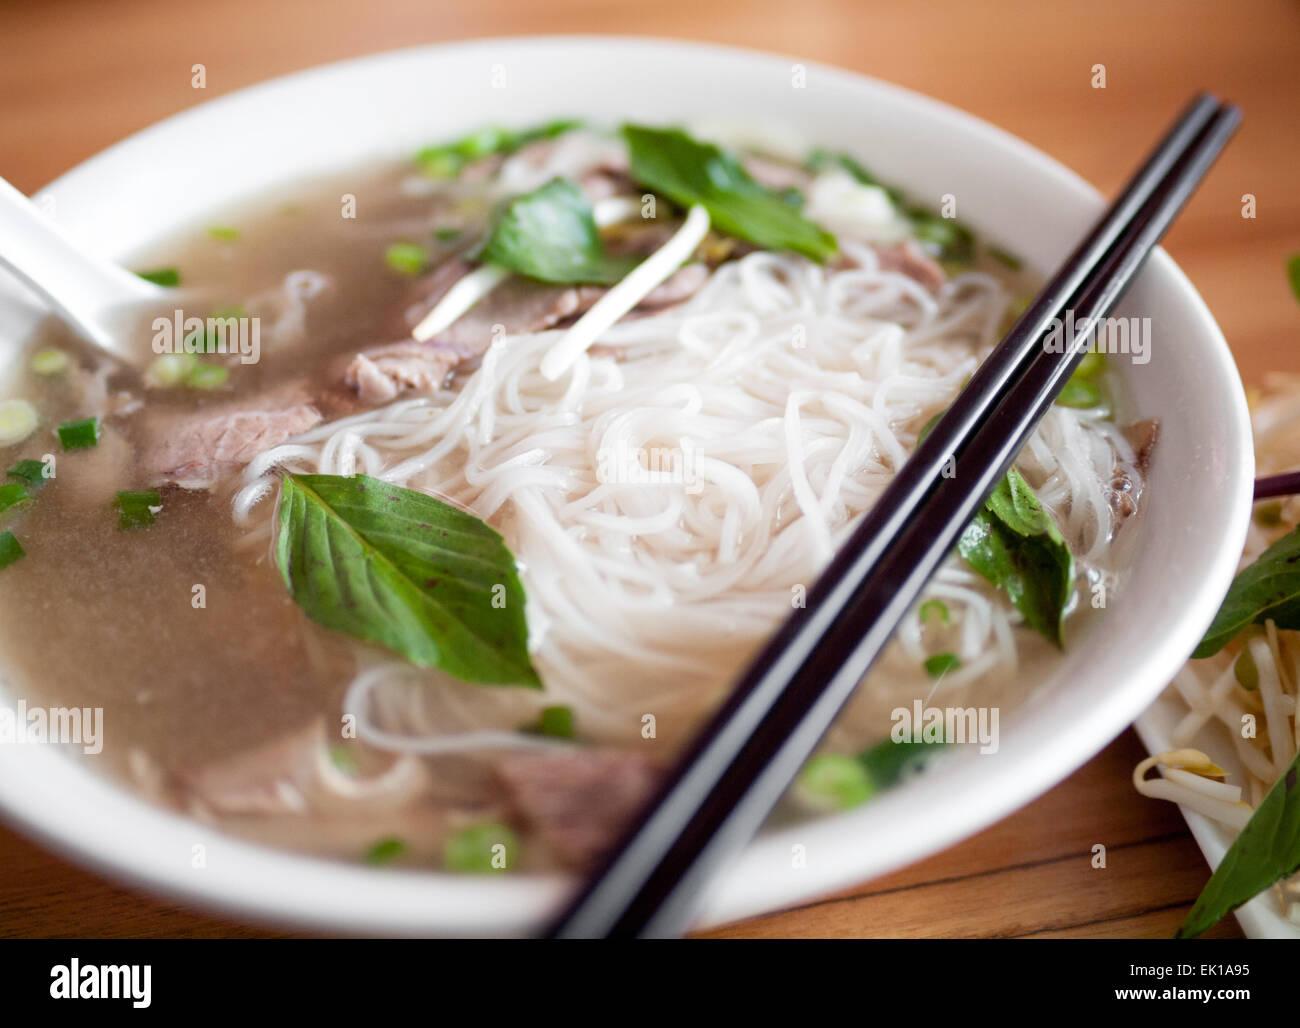 A bowl of beef brisket pho, a popular Vietnamese noodle soup. - Stock Image